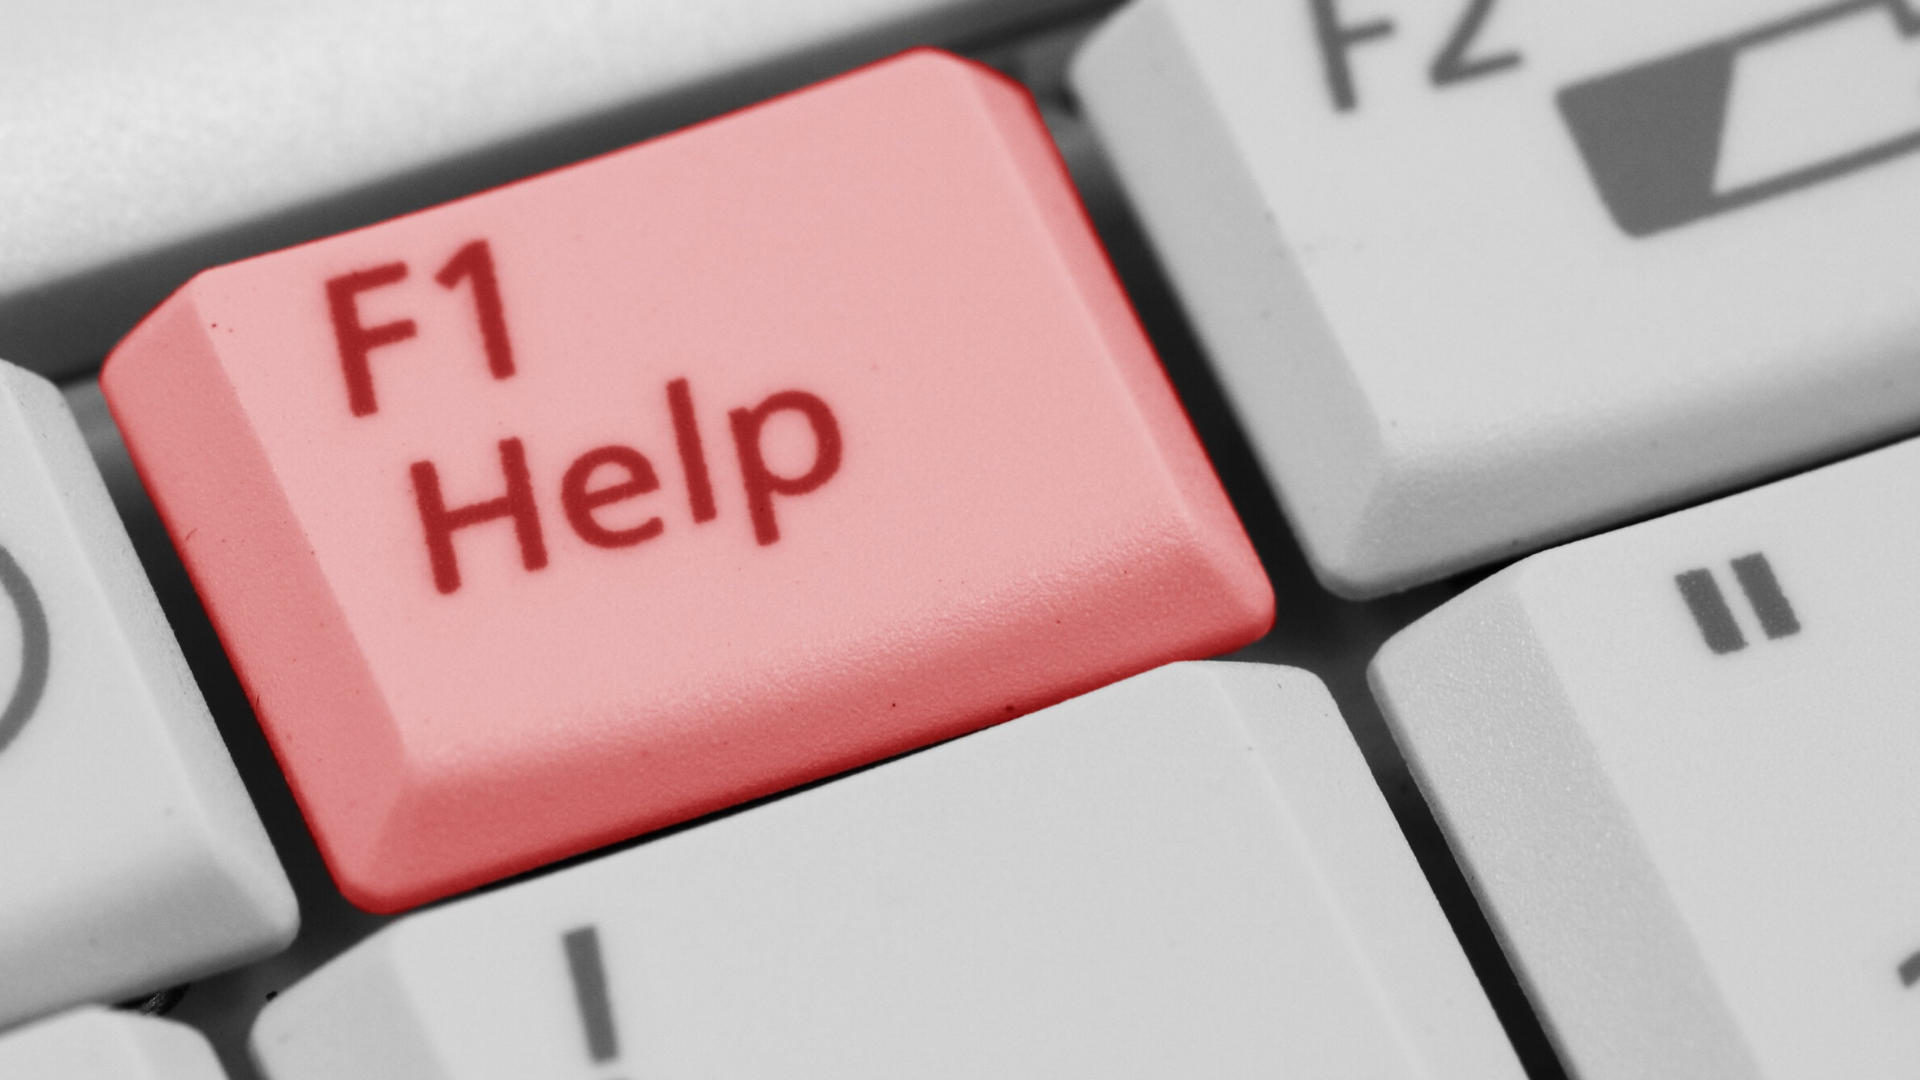 Covid19: Essential resources for Social Enterprises